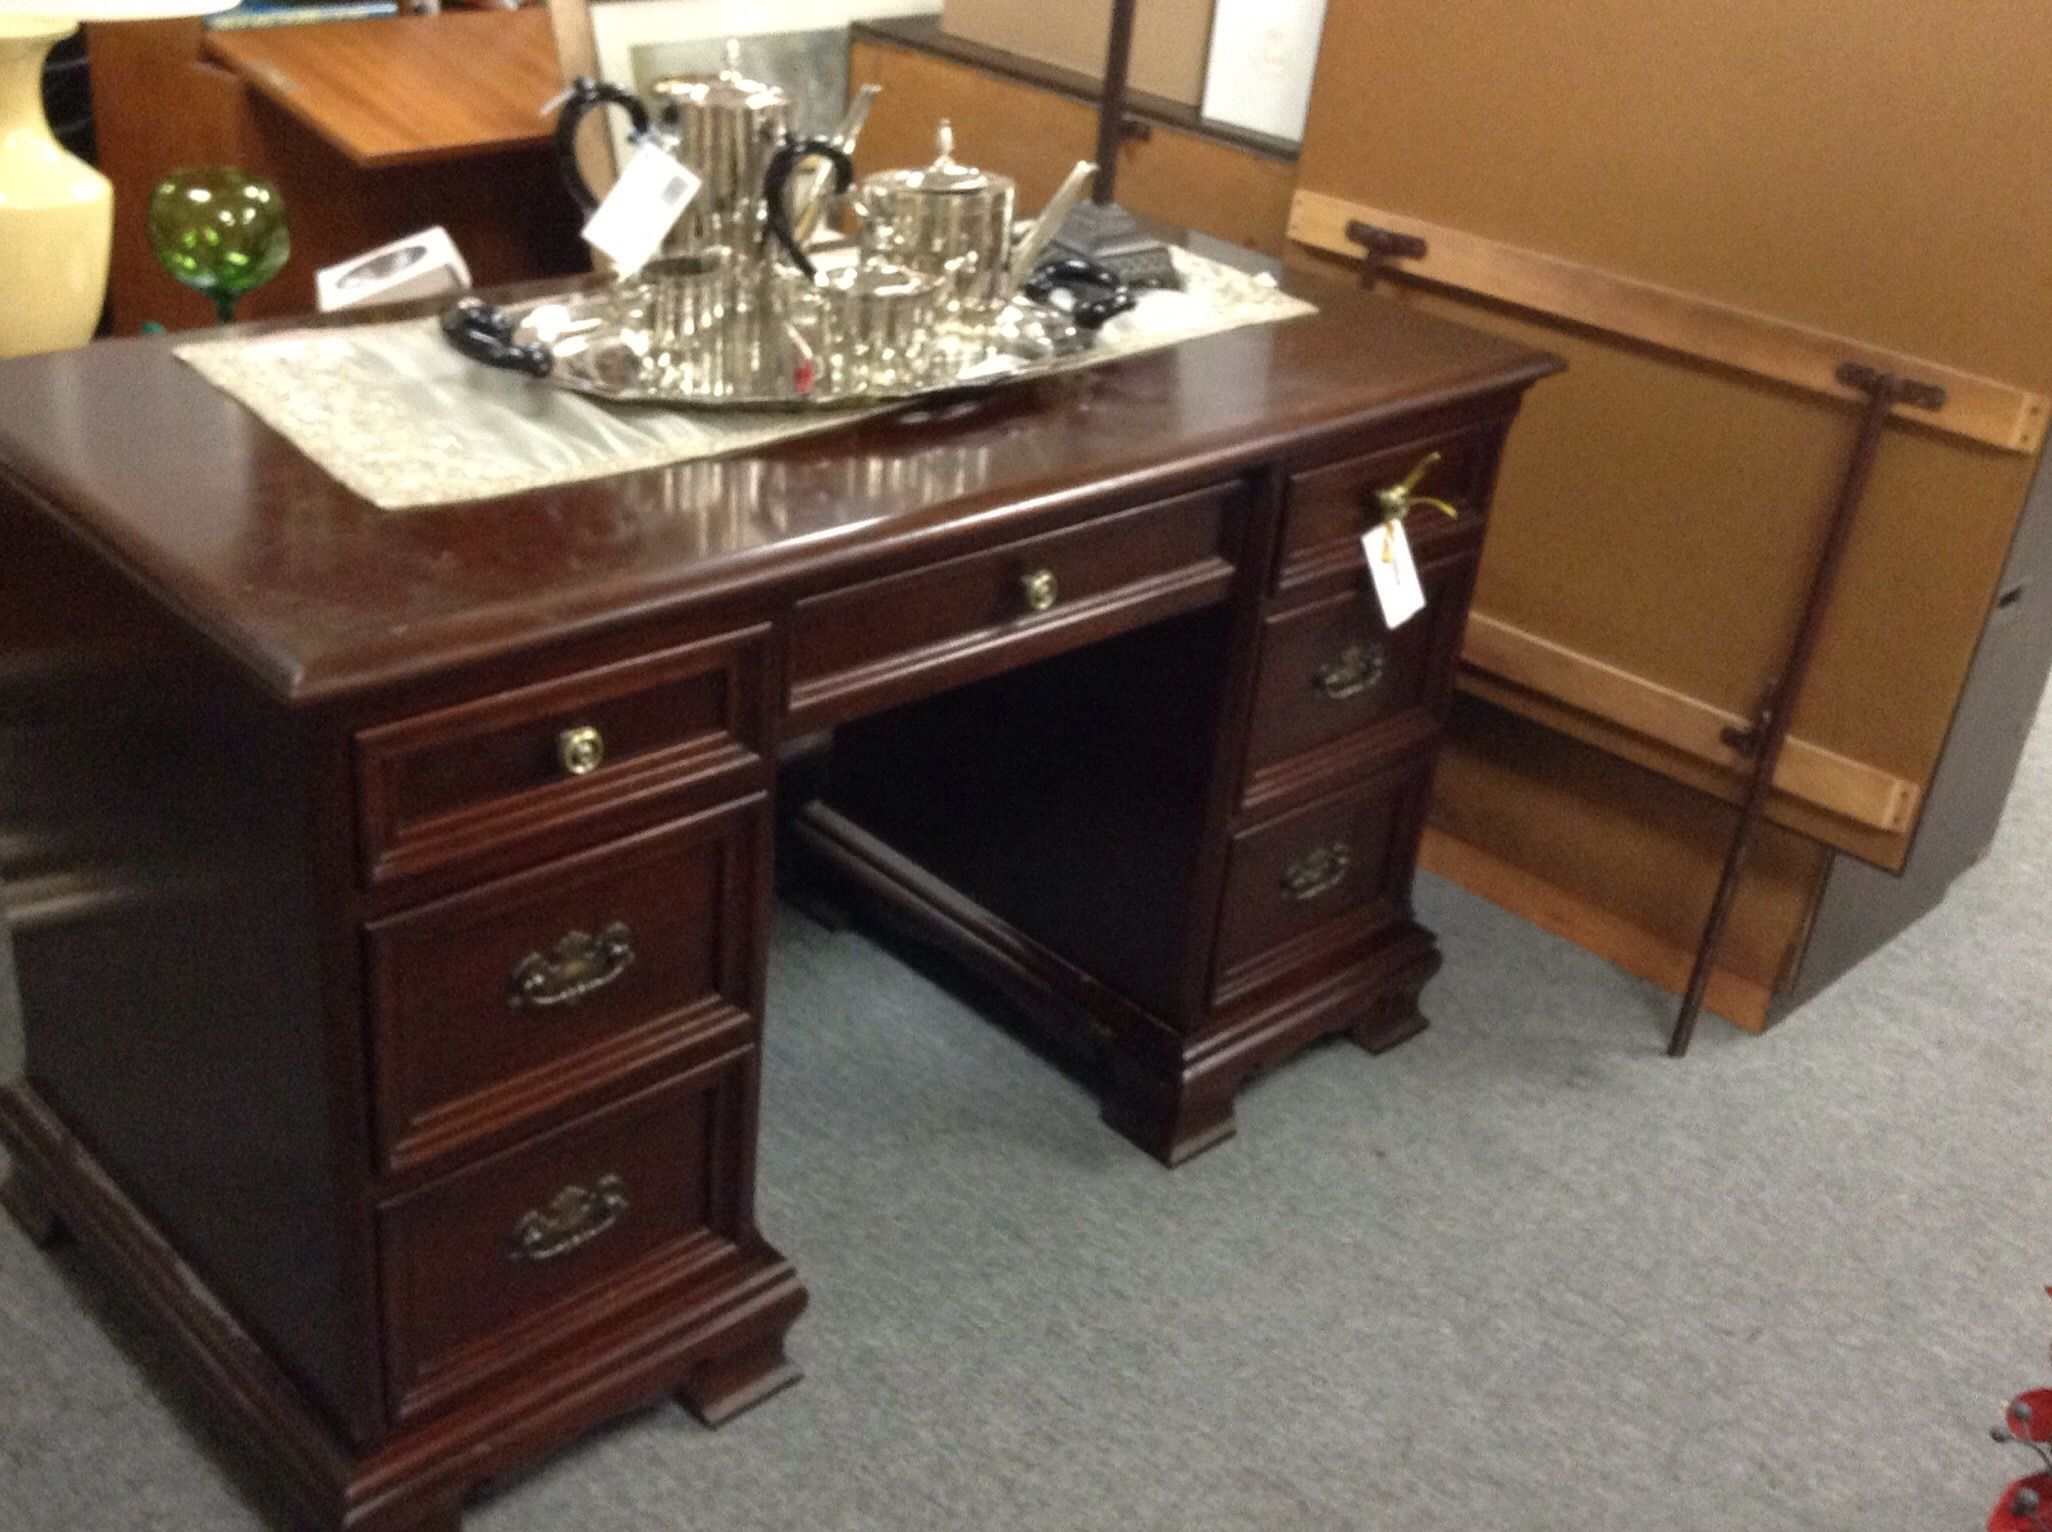 gibbard mahogany desk gibbard legacy series desk in solid mahogany very rare item - Mahogany Desk